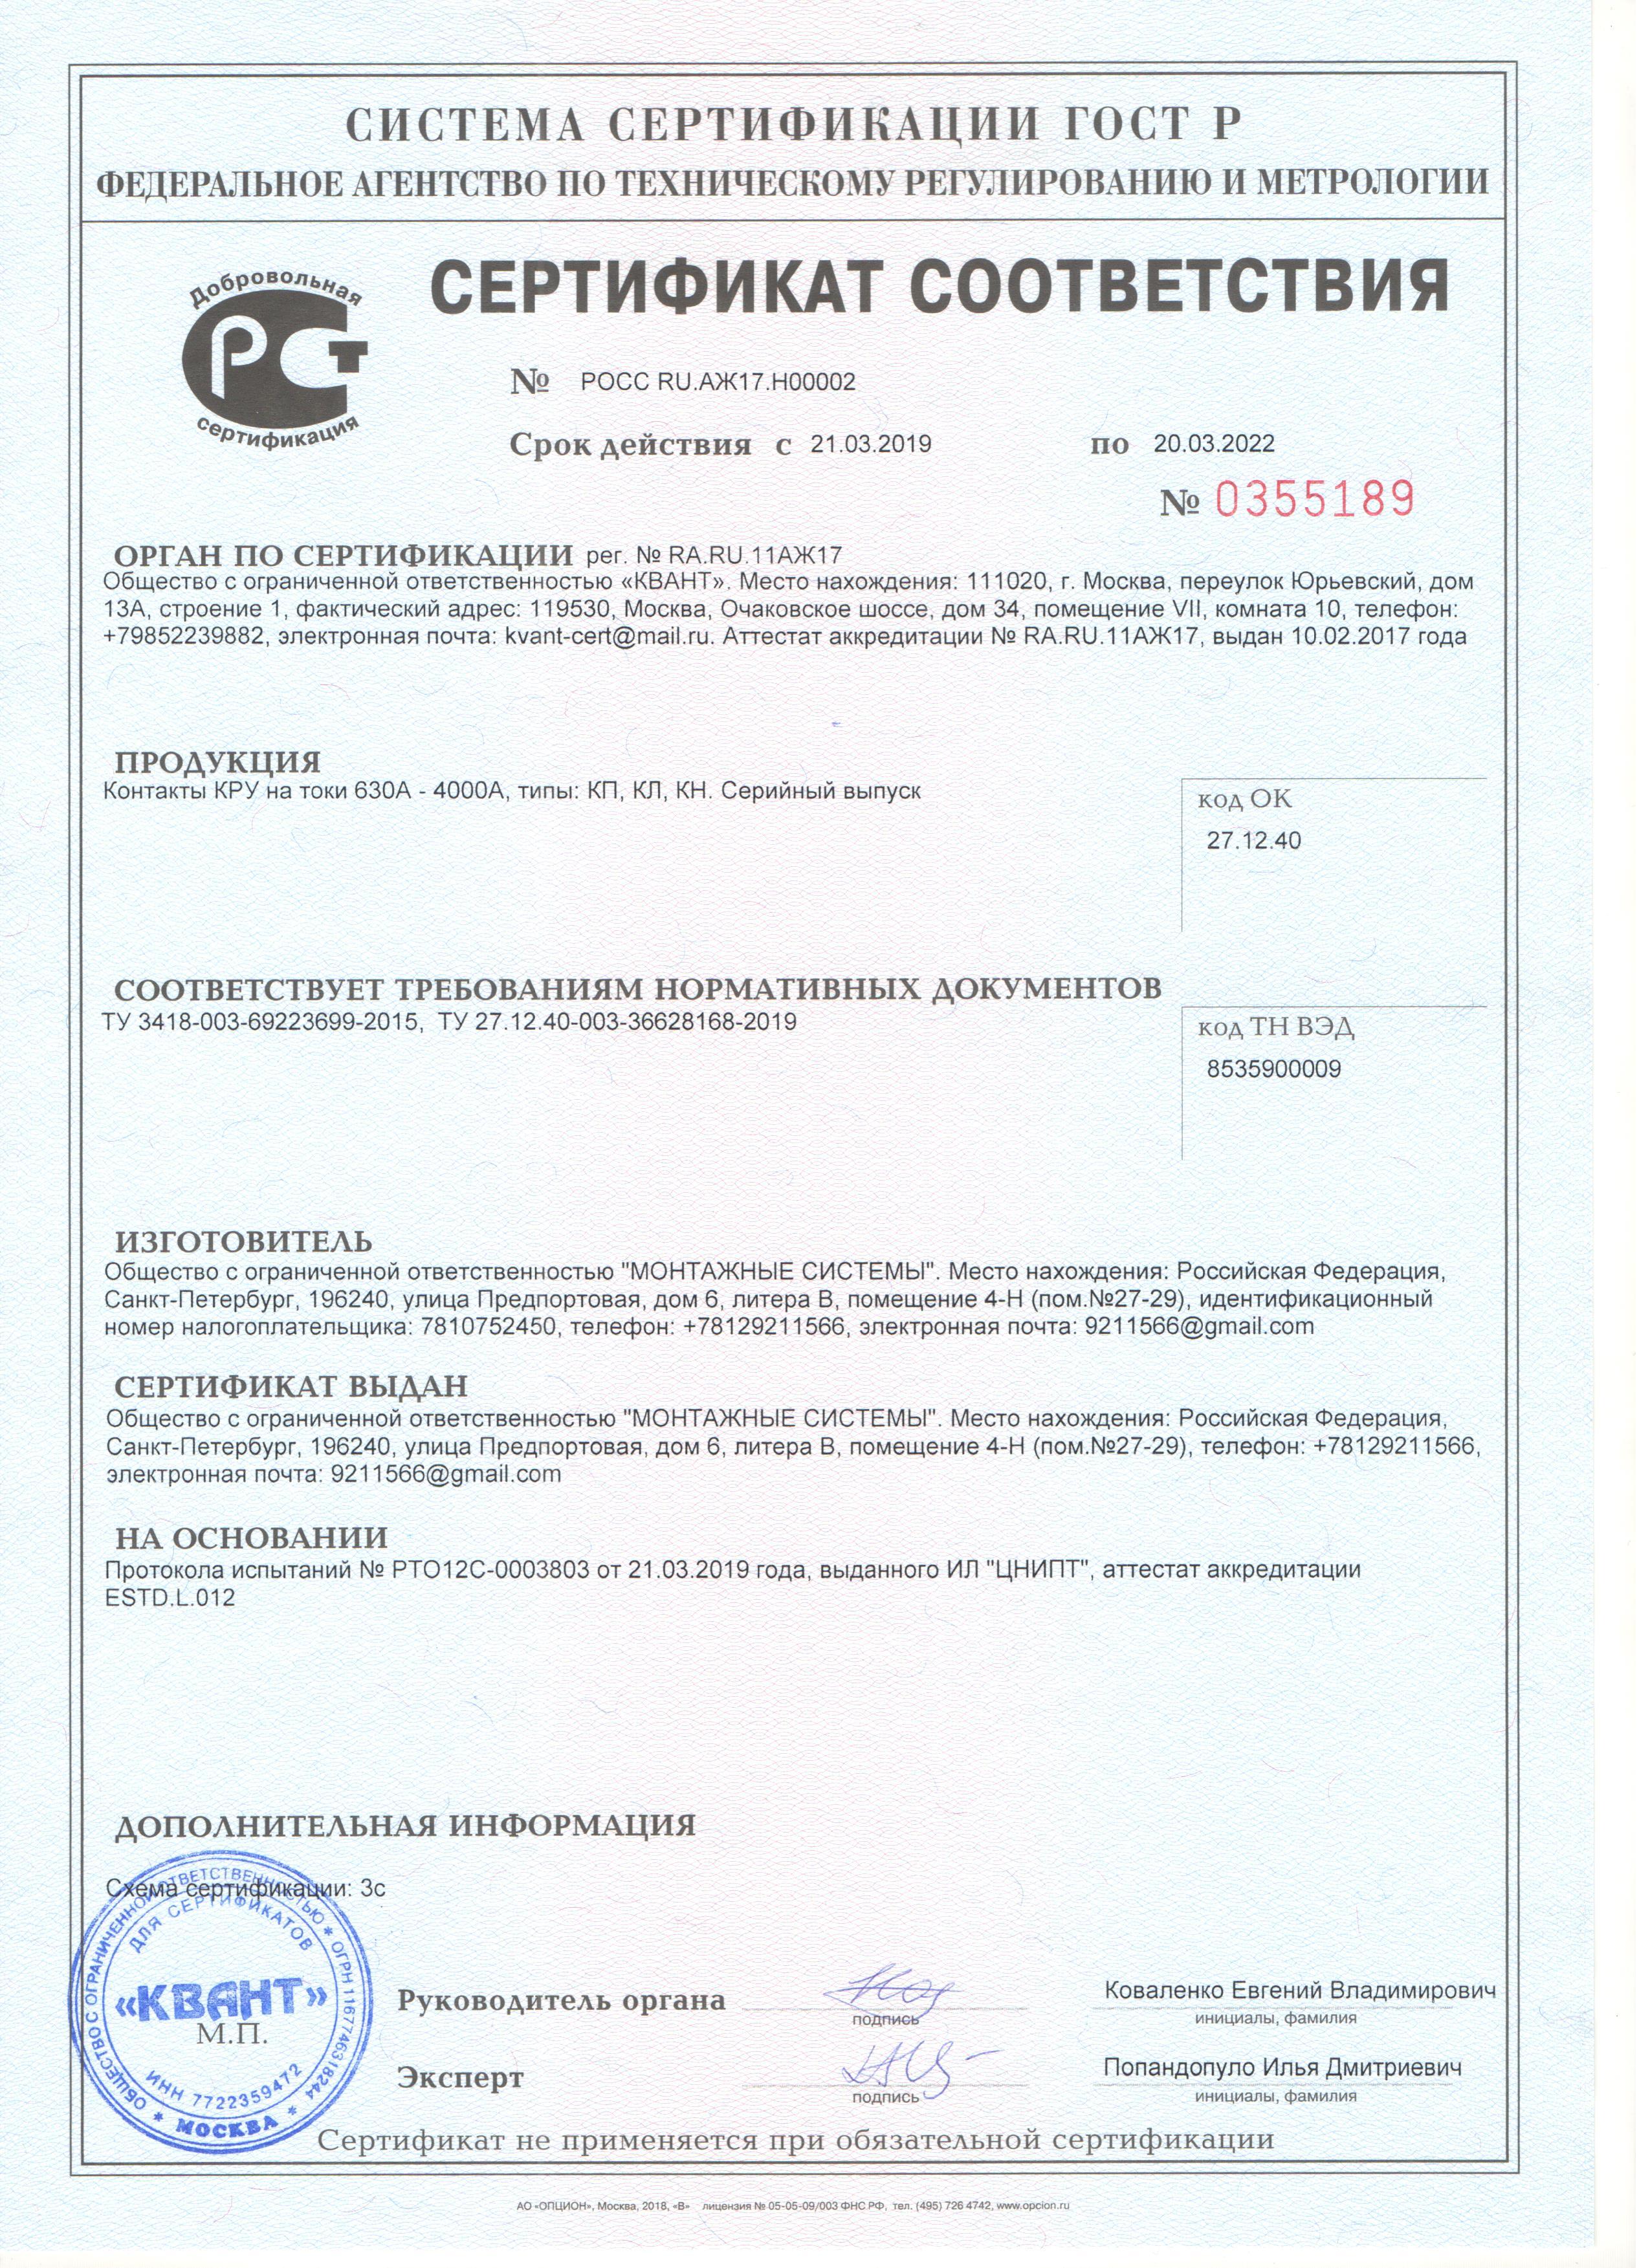 http://montagesystems.ru/files/Сертификат%20на%20Контакты%20КРУ%20до%2020.03.2022.jpeg